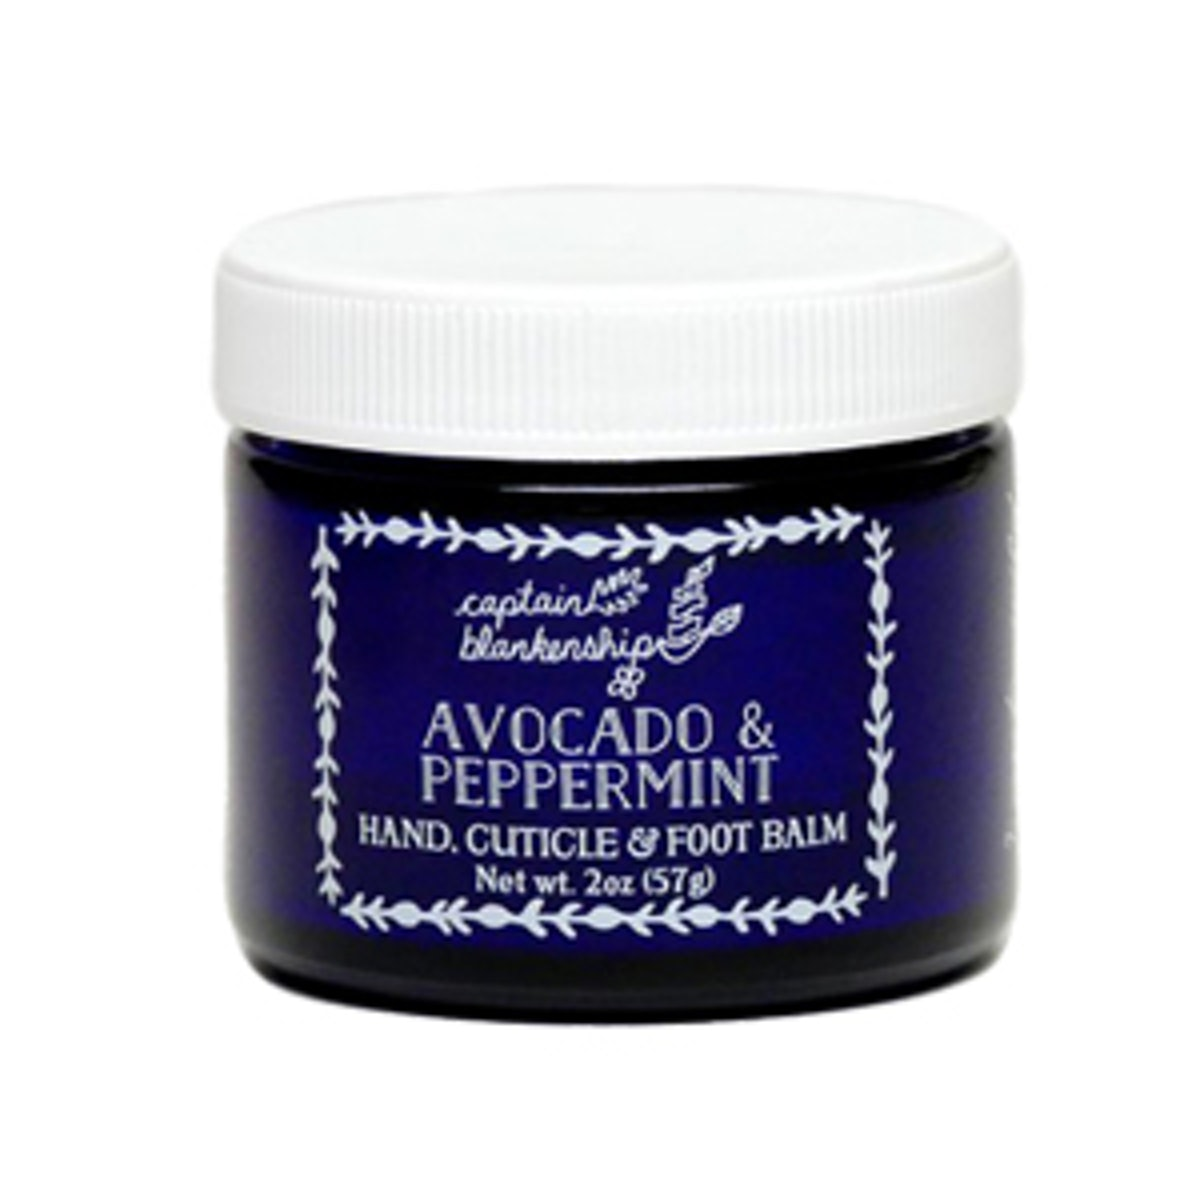 Avocado & Peppermint Hand, Cuticle & Foot Balm